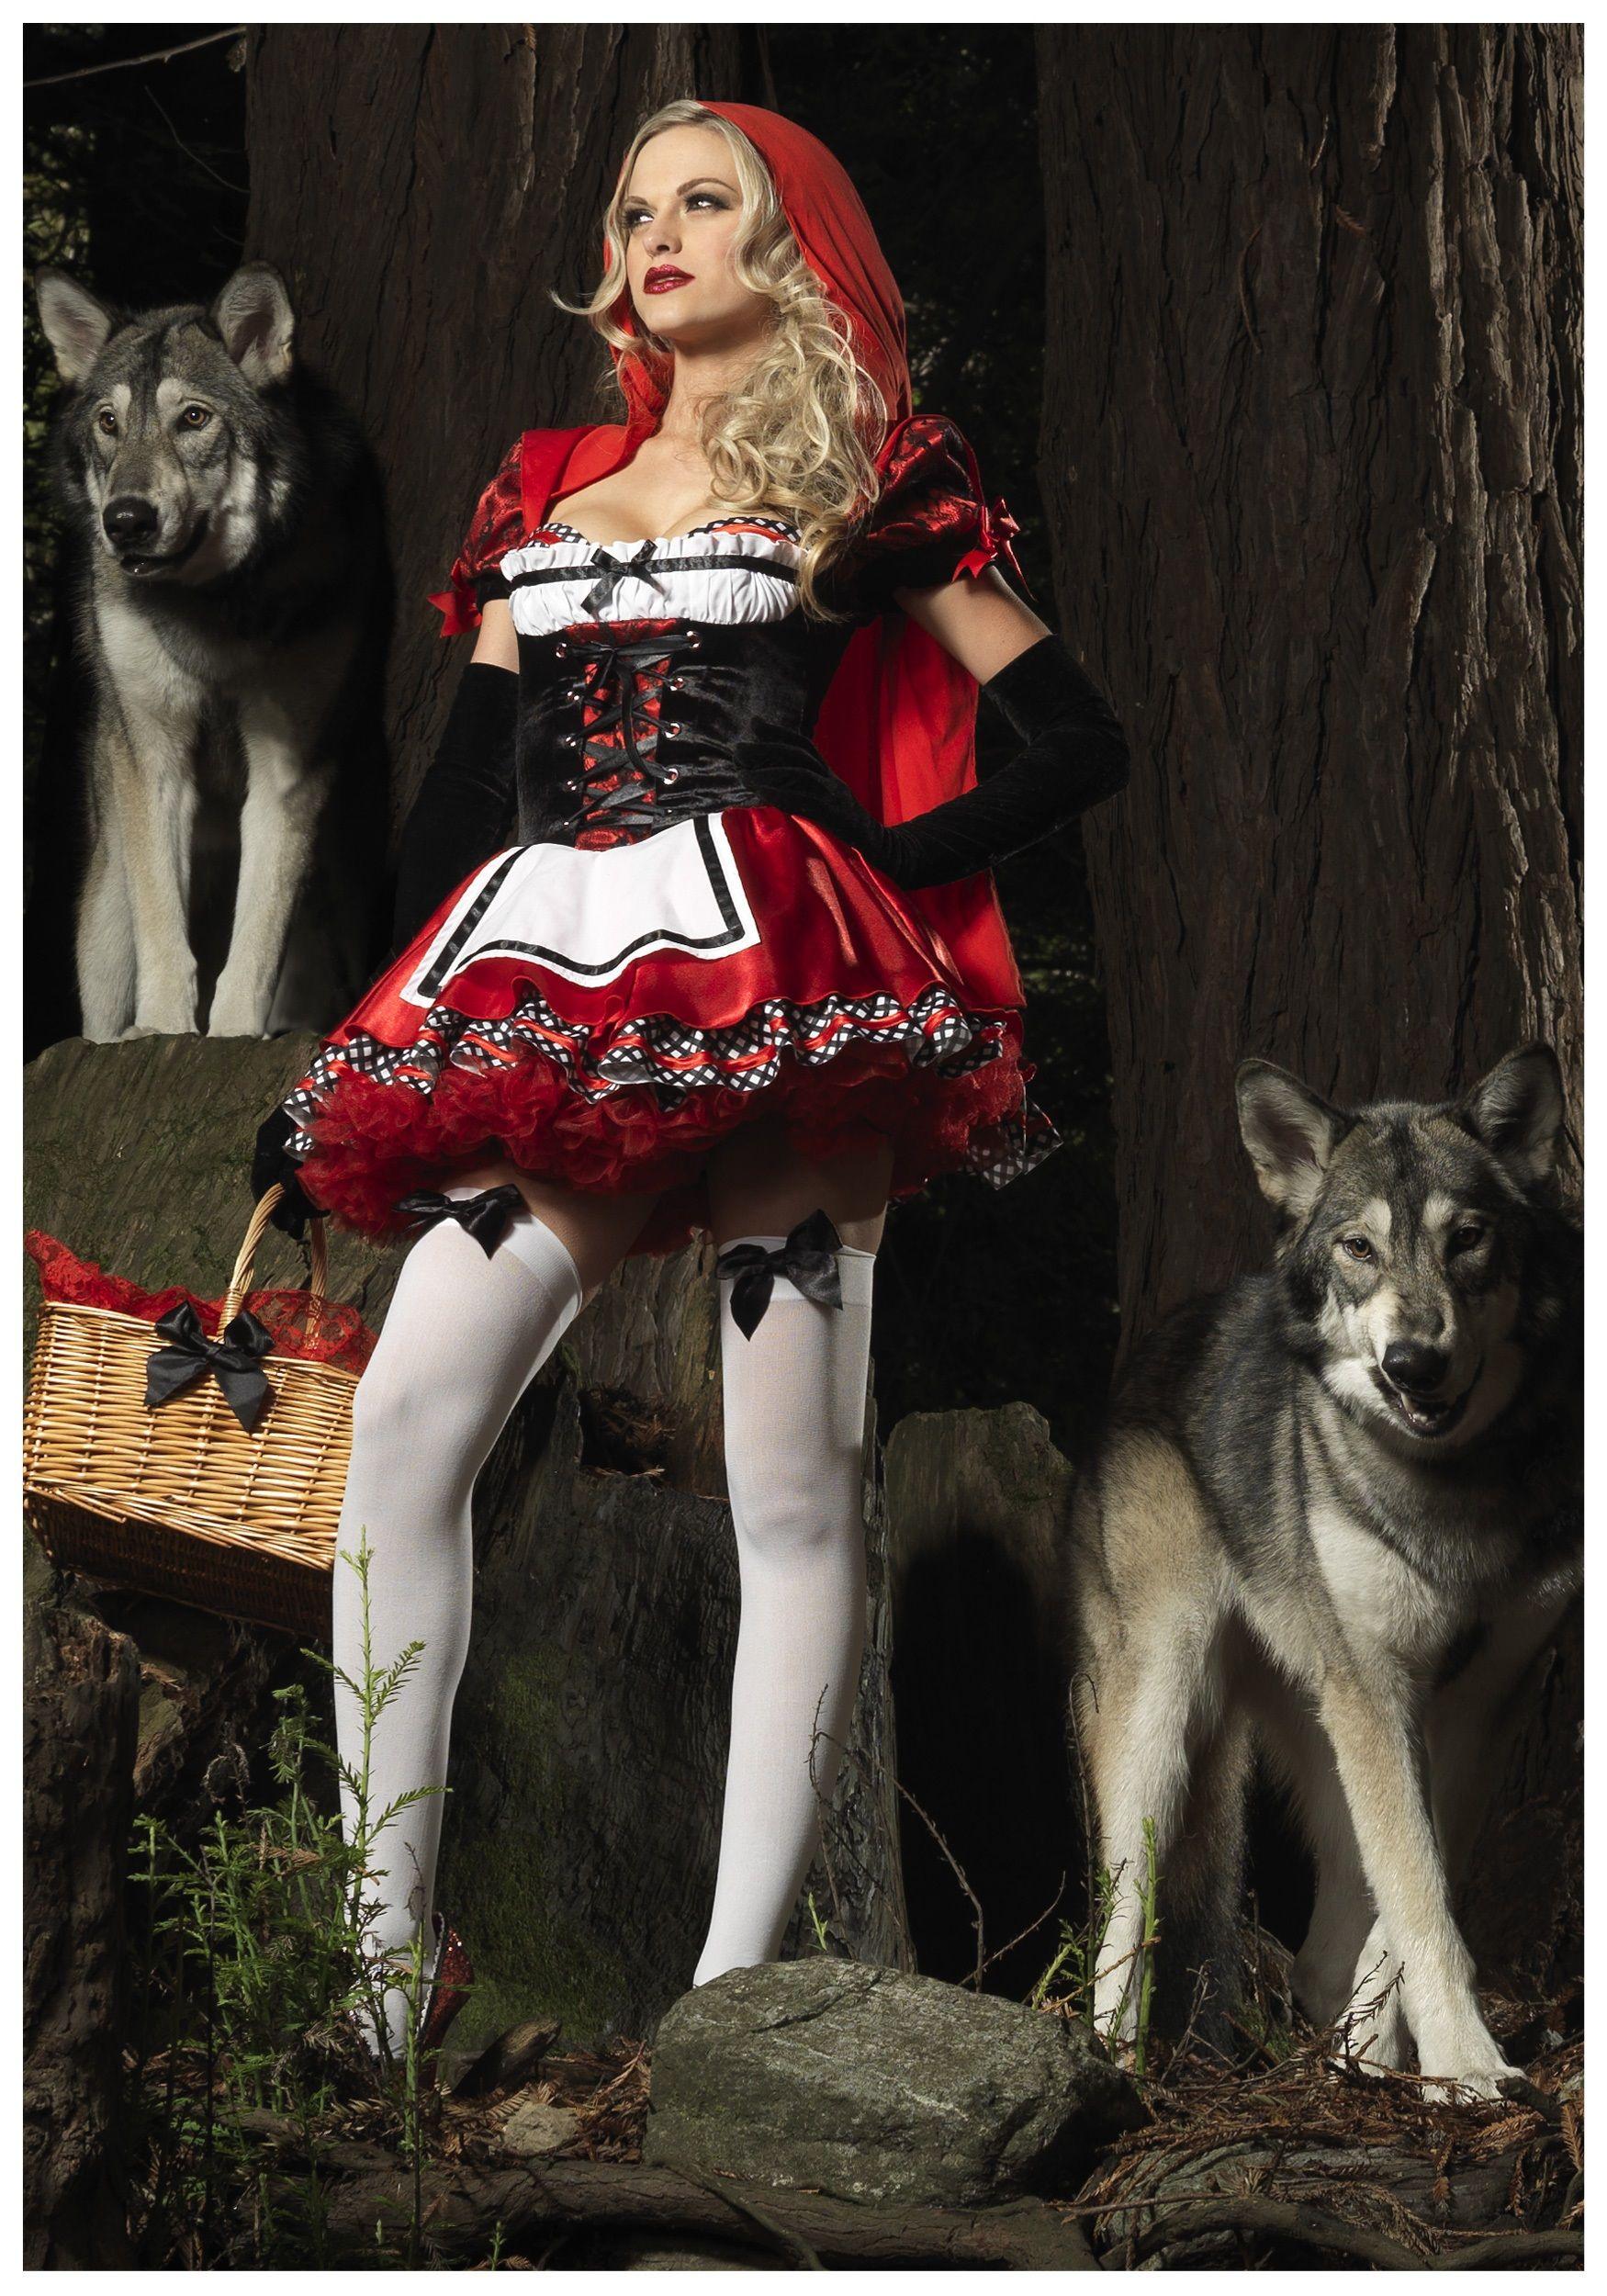 Erotic Red Riding Hood | ...,